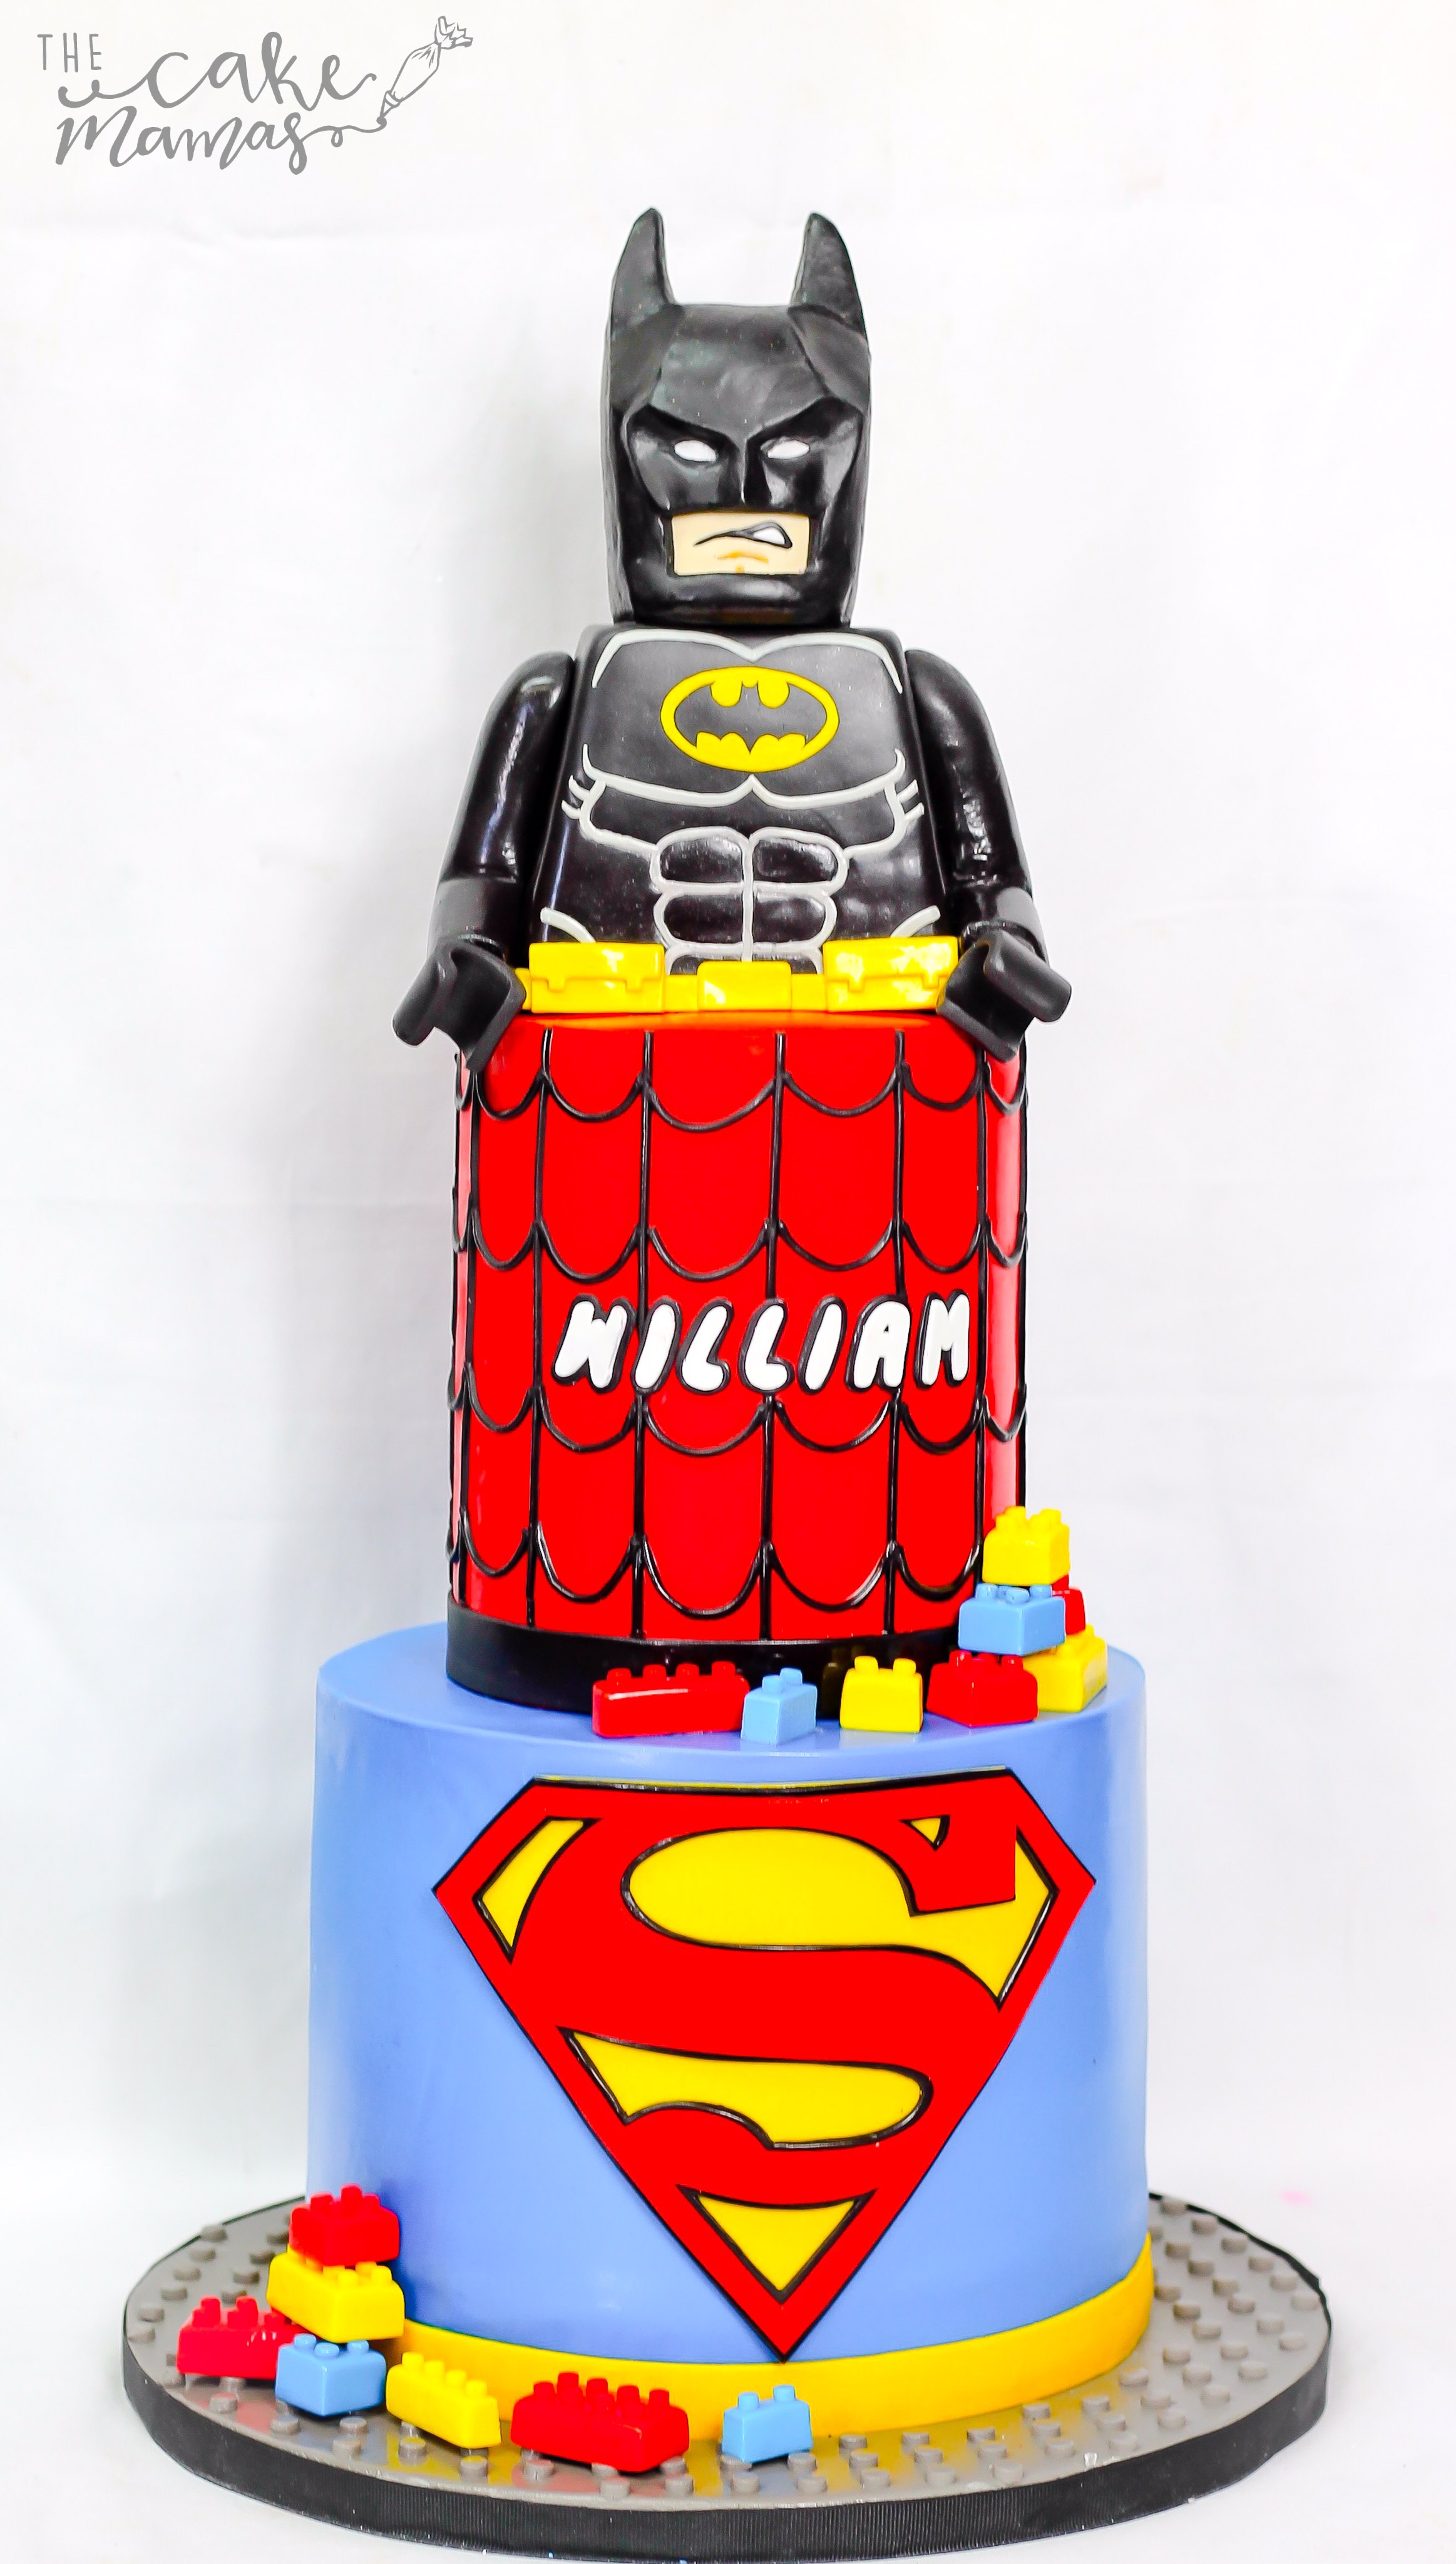 Lego Batman and Superman birthday